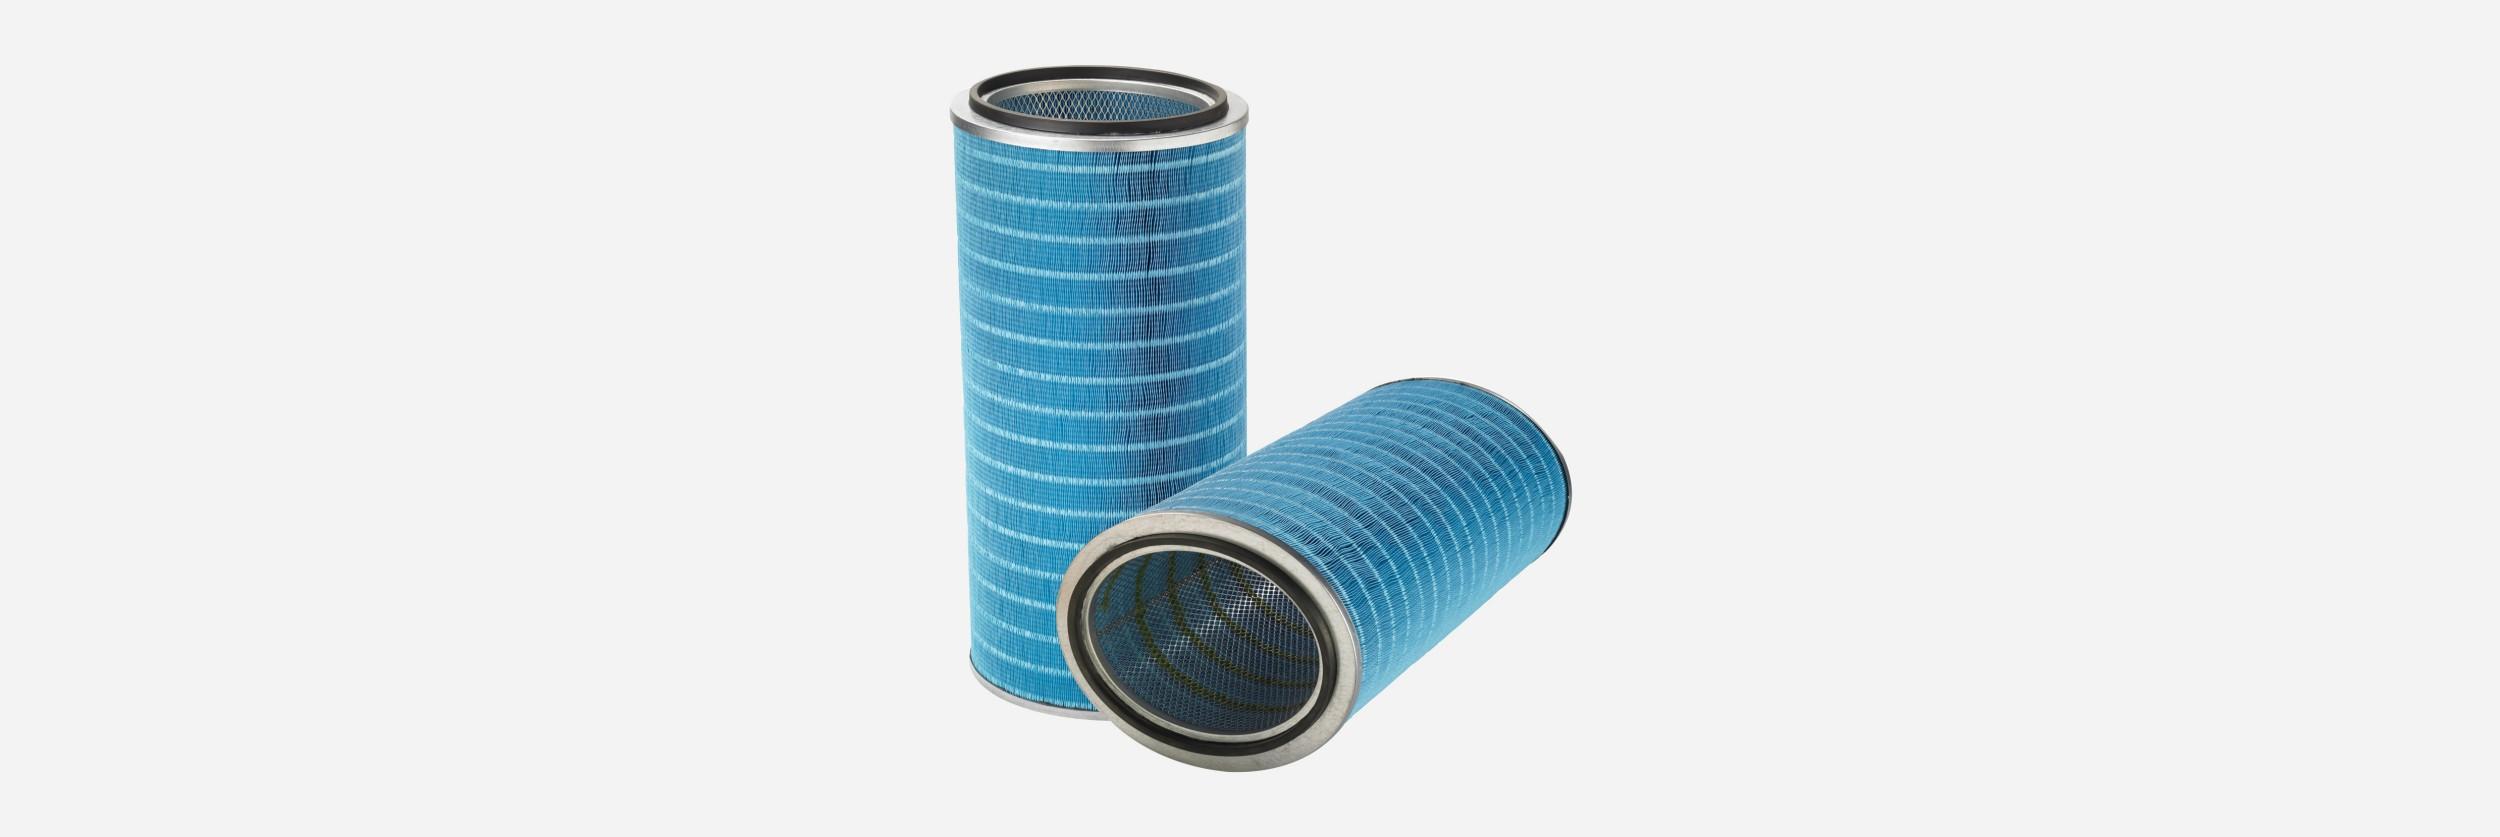 Donaldson Fibra Web Cartridge Filter Hero image | AIRPLUS Industrial